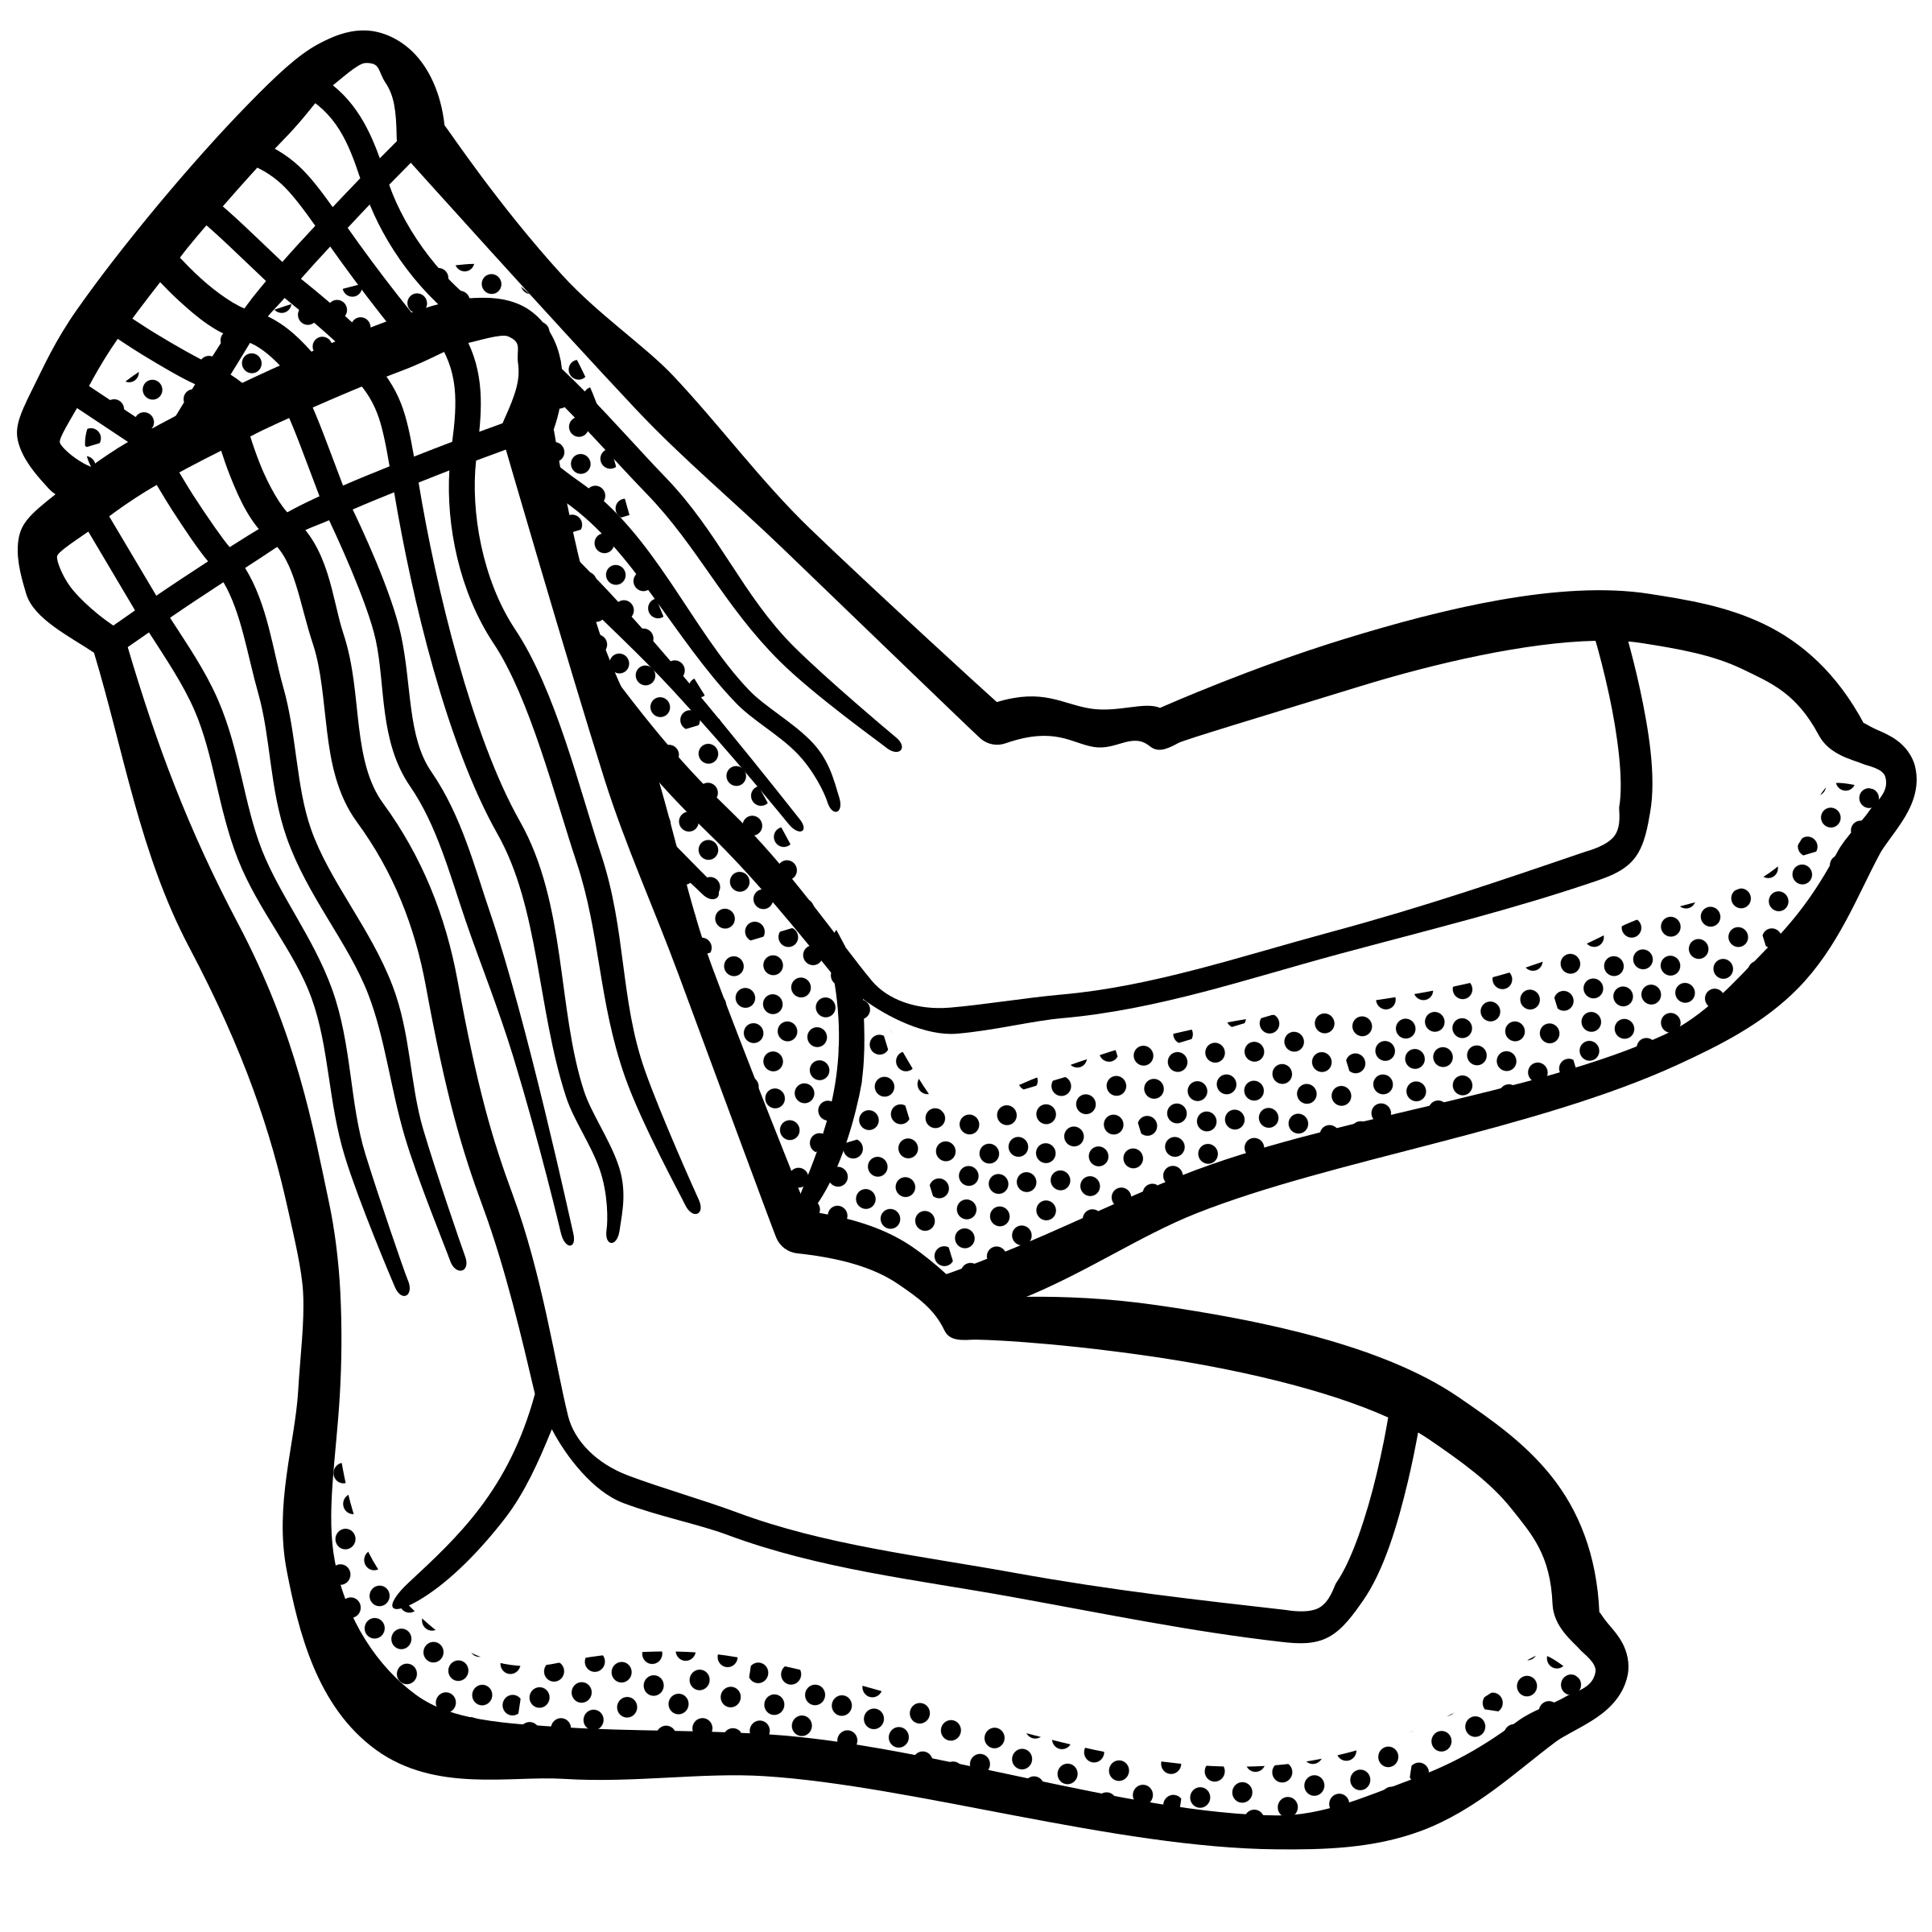 Mlk clipart black and white. Socks drawing at getdrawings